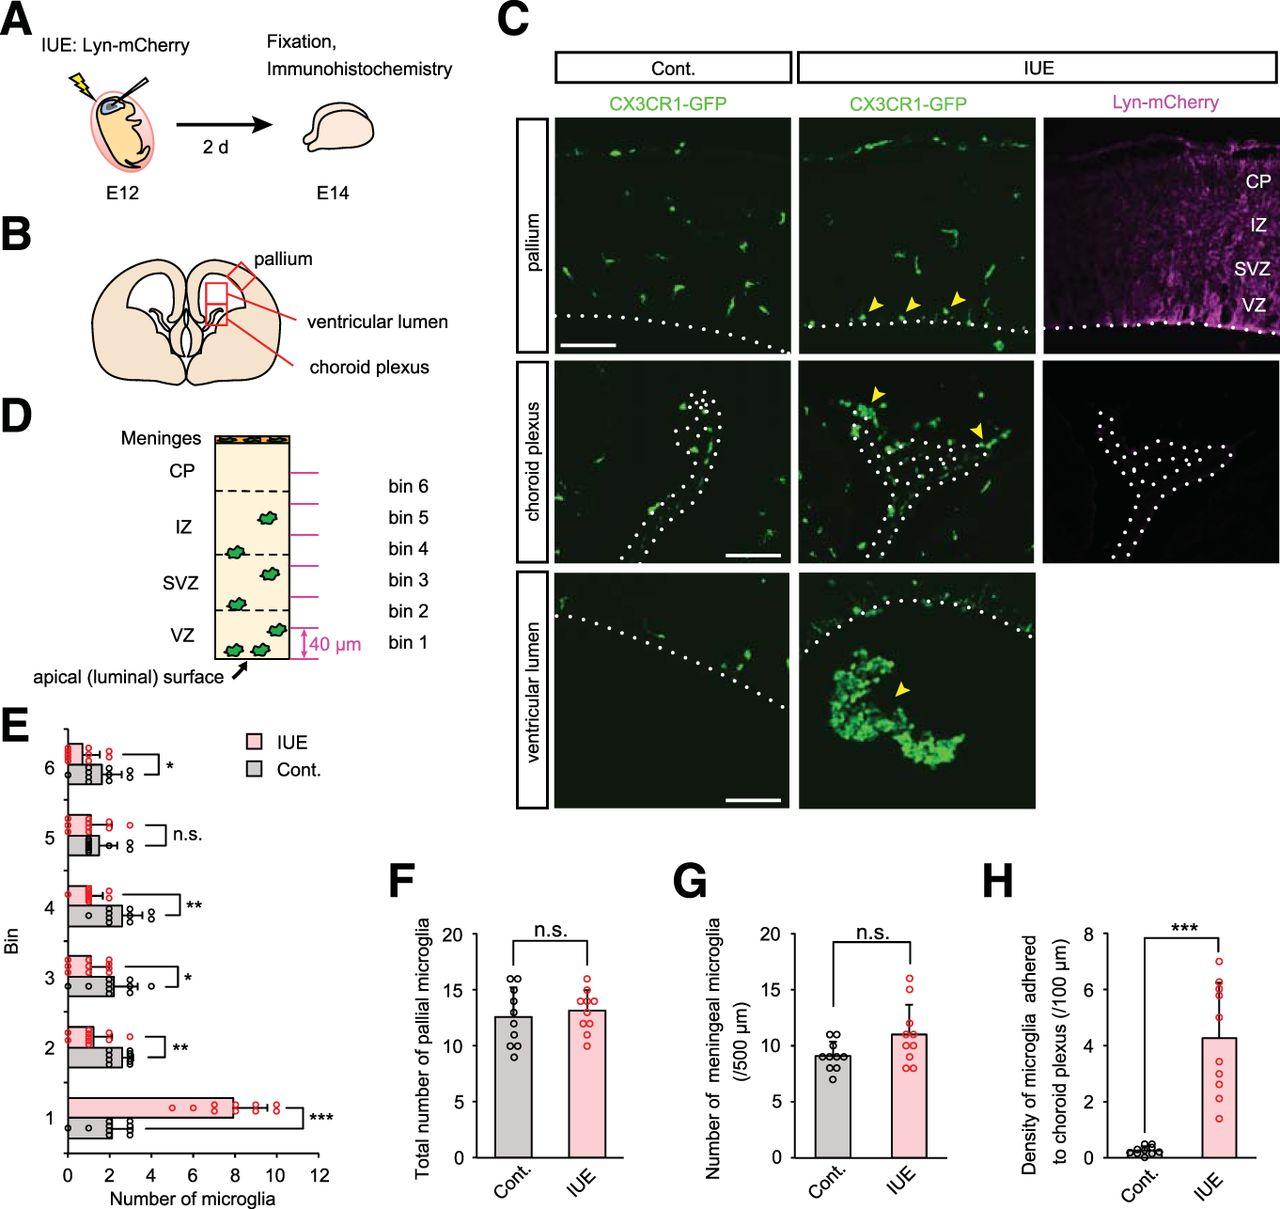 Embryonic Neocortical Microglia Express Toll-Like Receptor 9